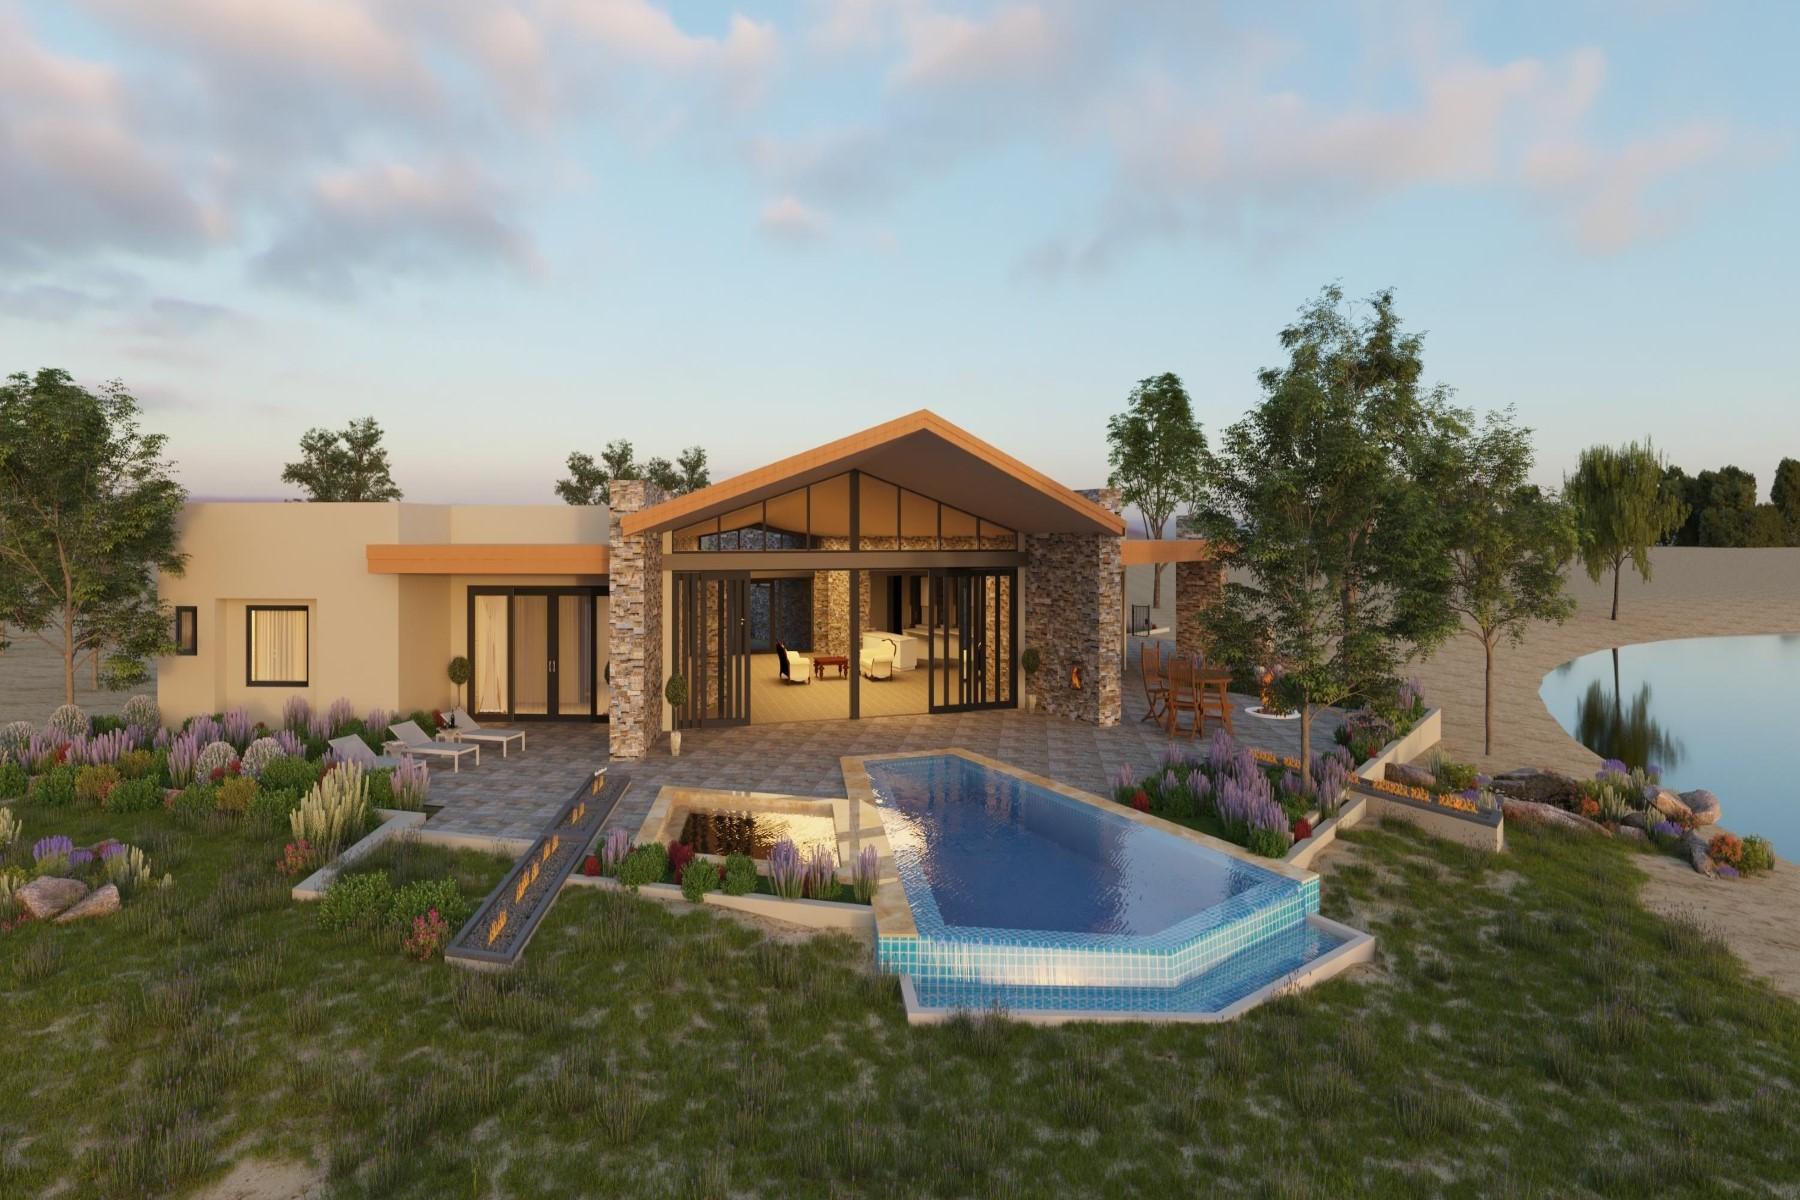 single family homes for Active at The Boulders 4009 E La Ultima Piedra Carefree, Arizona 85377 United States